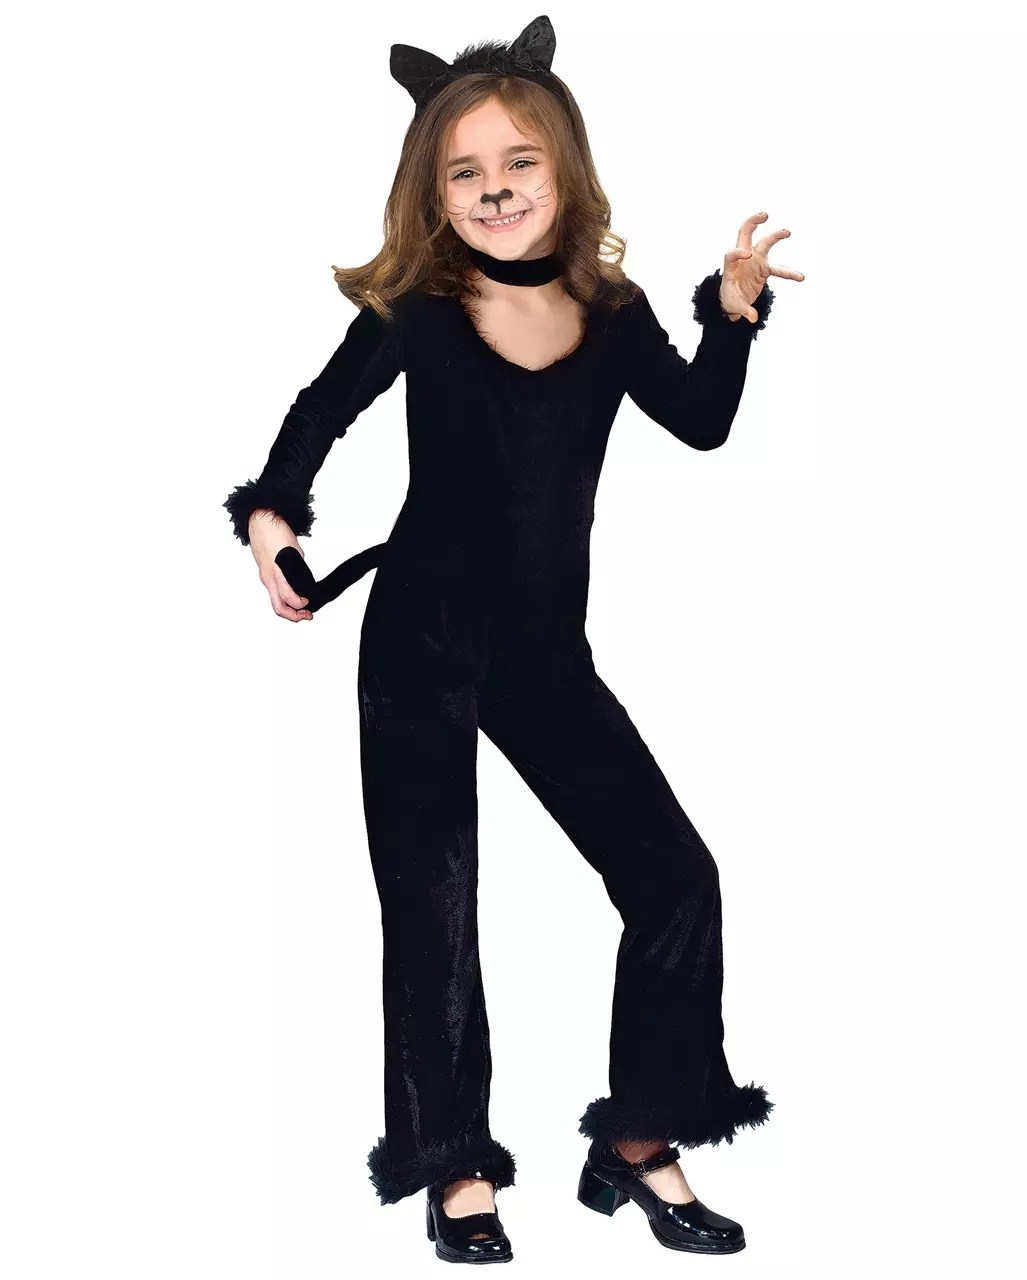 Riveting Horror Com Black Cat Kids Halloween Costume Hallowen Costum Udaf Black Cat Costume 12 Months Black Cat Costume Baby Girl Black Cat Kids Costume baby Black Cat Costume